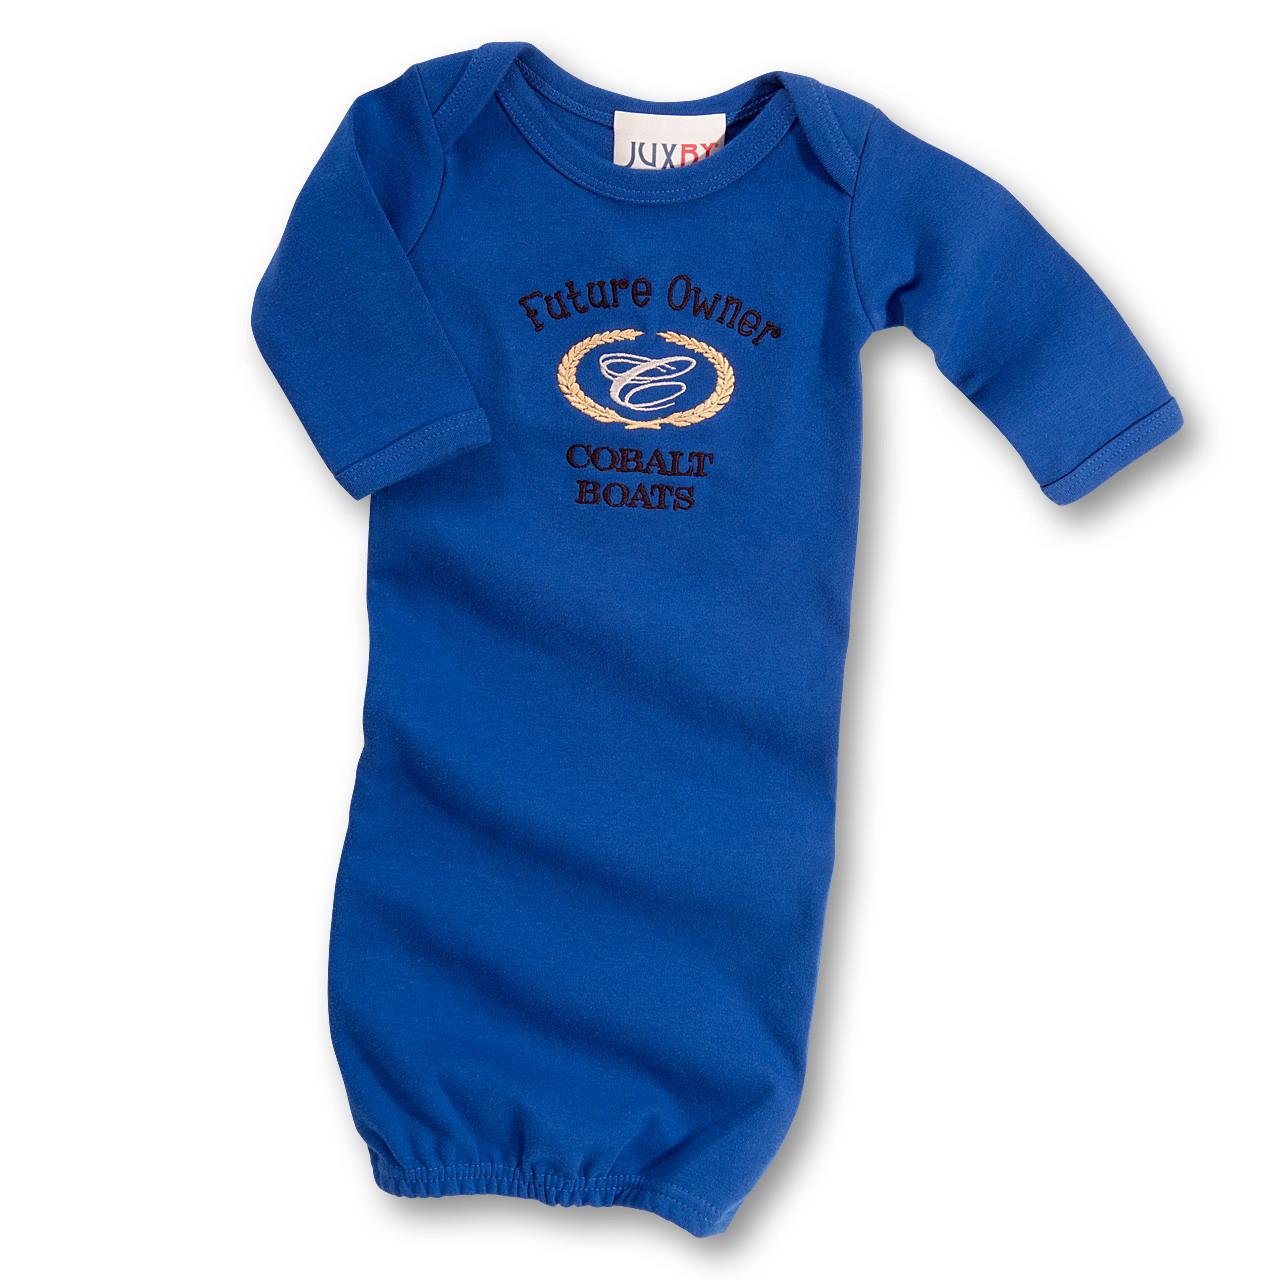 I107 Infant Gown - Cobalt Sportswear